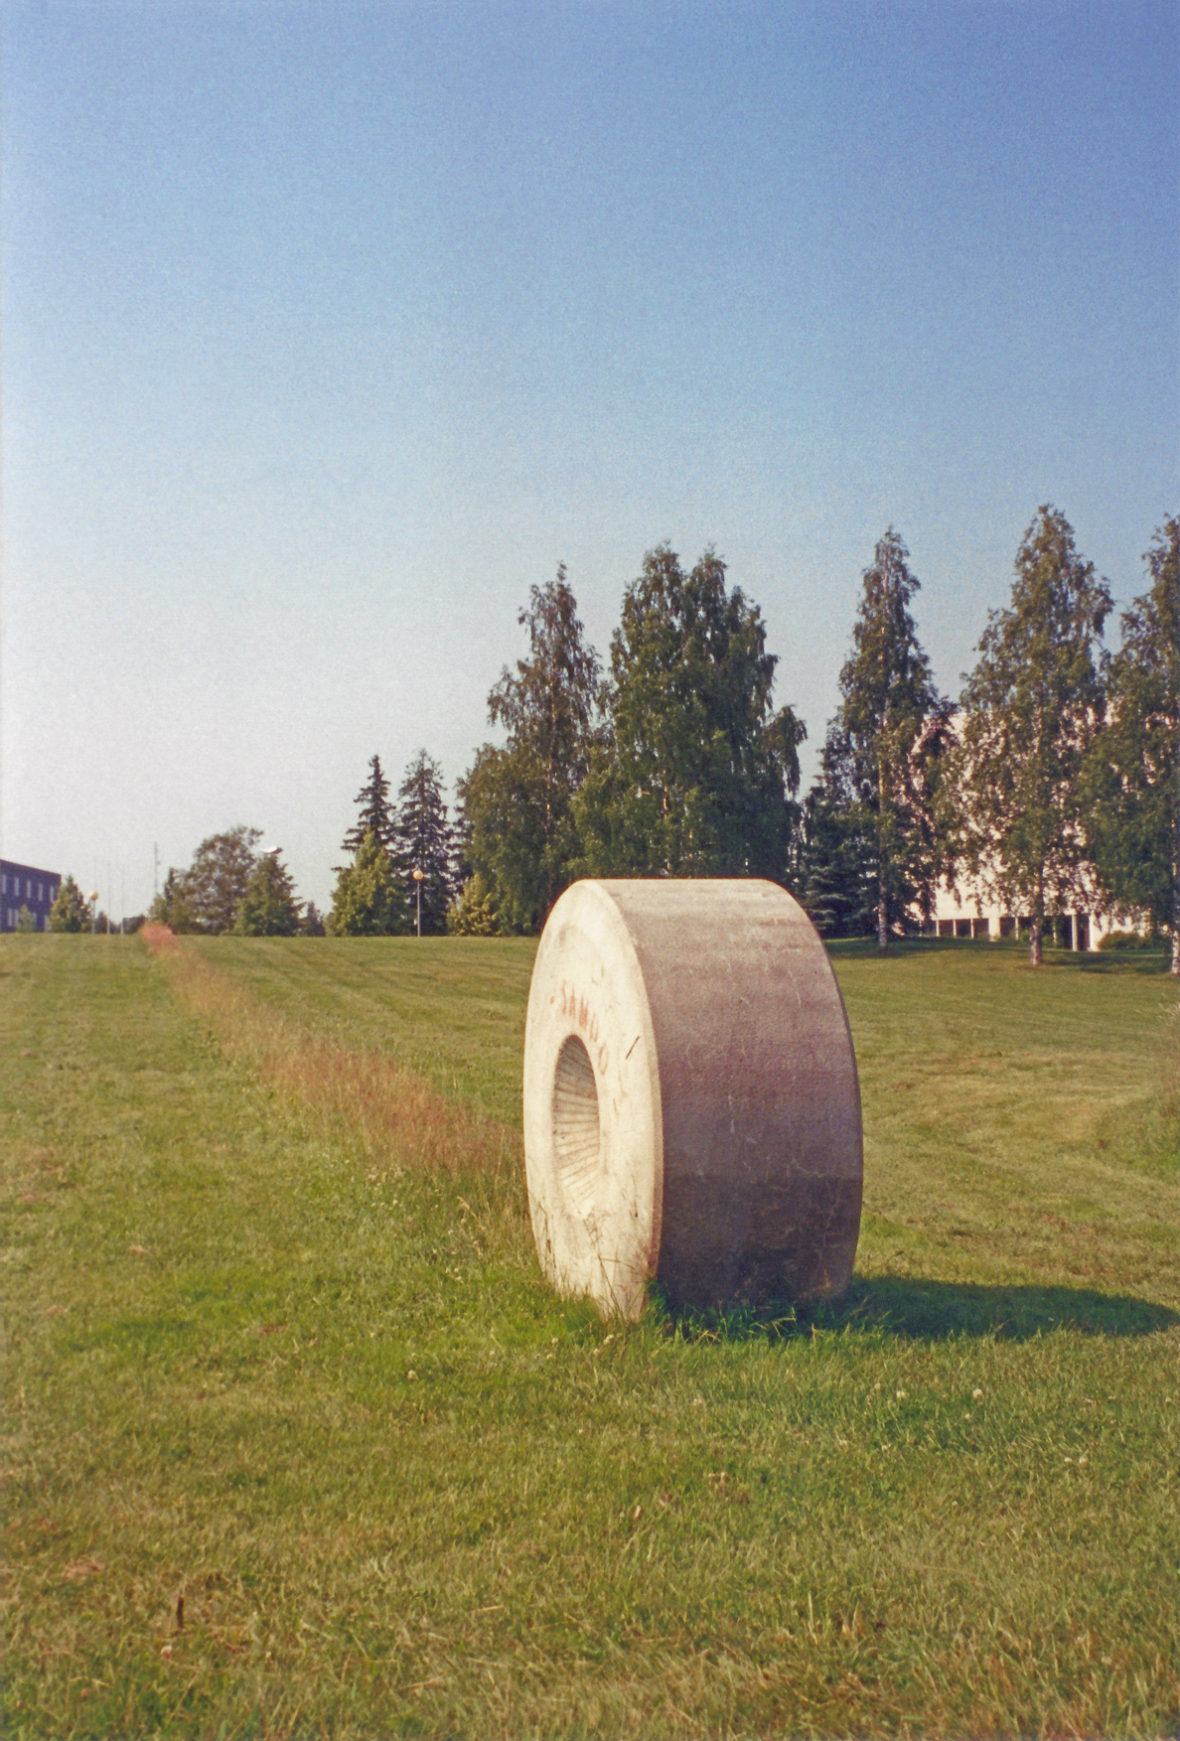 PULTERI, 2002